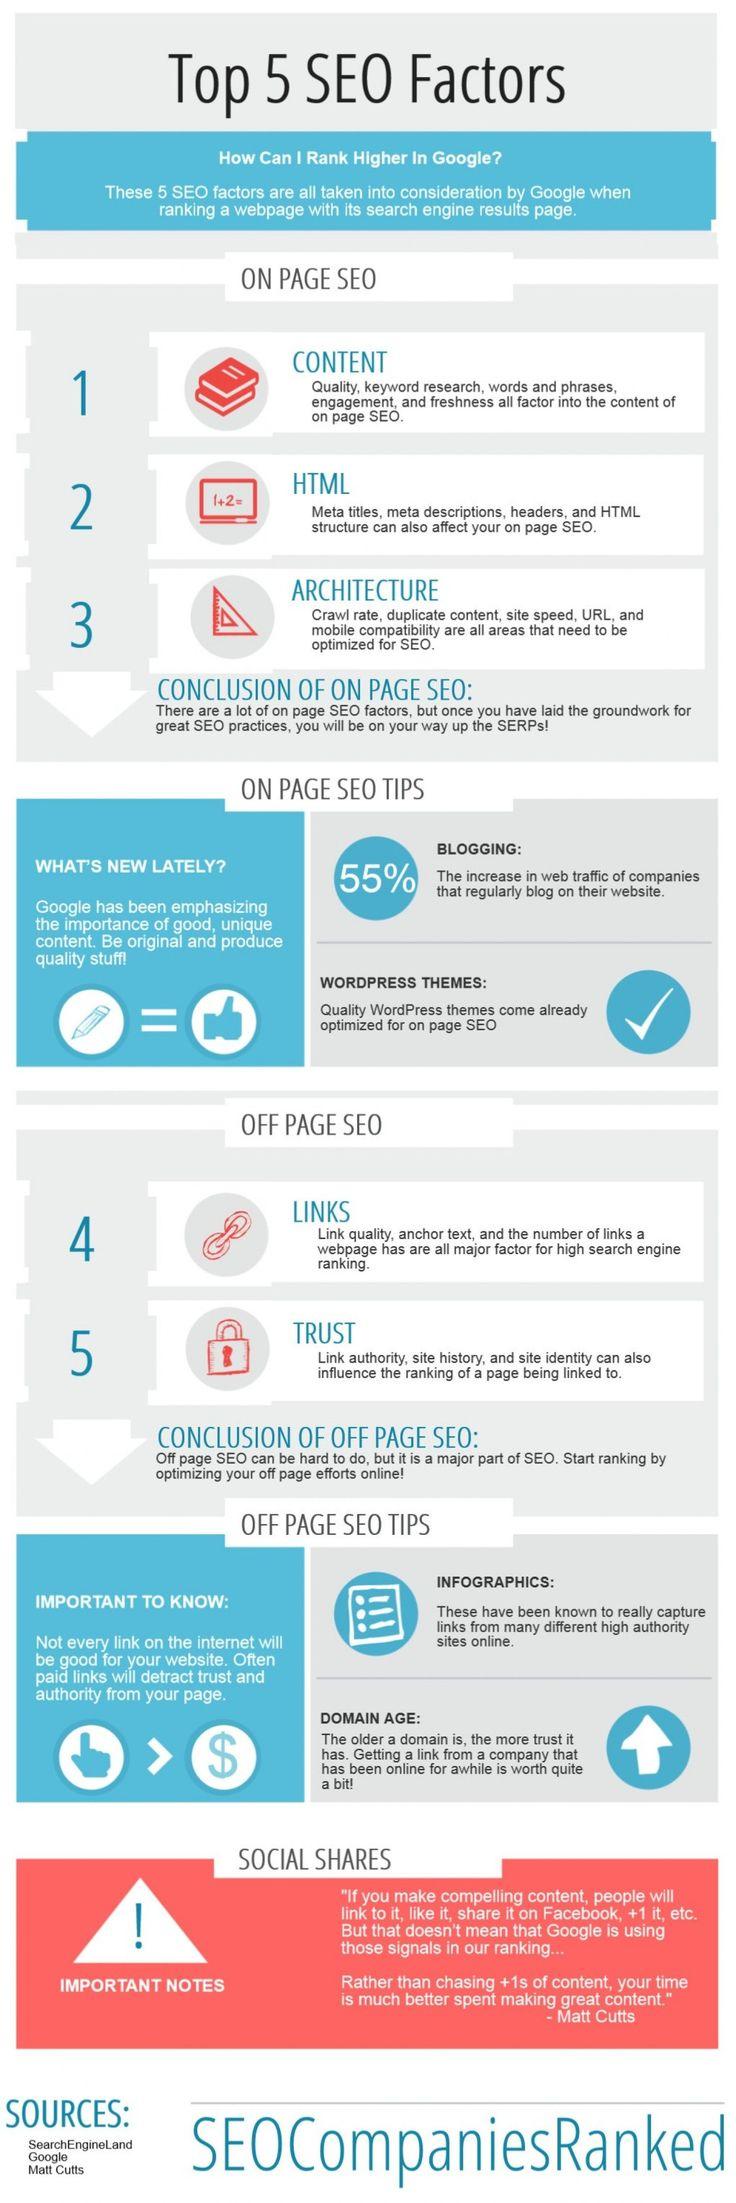 Top 5 SEO Ranking Factors  Infographic